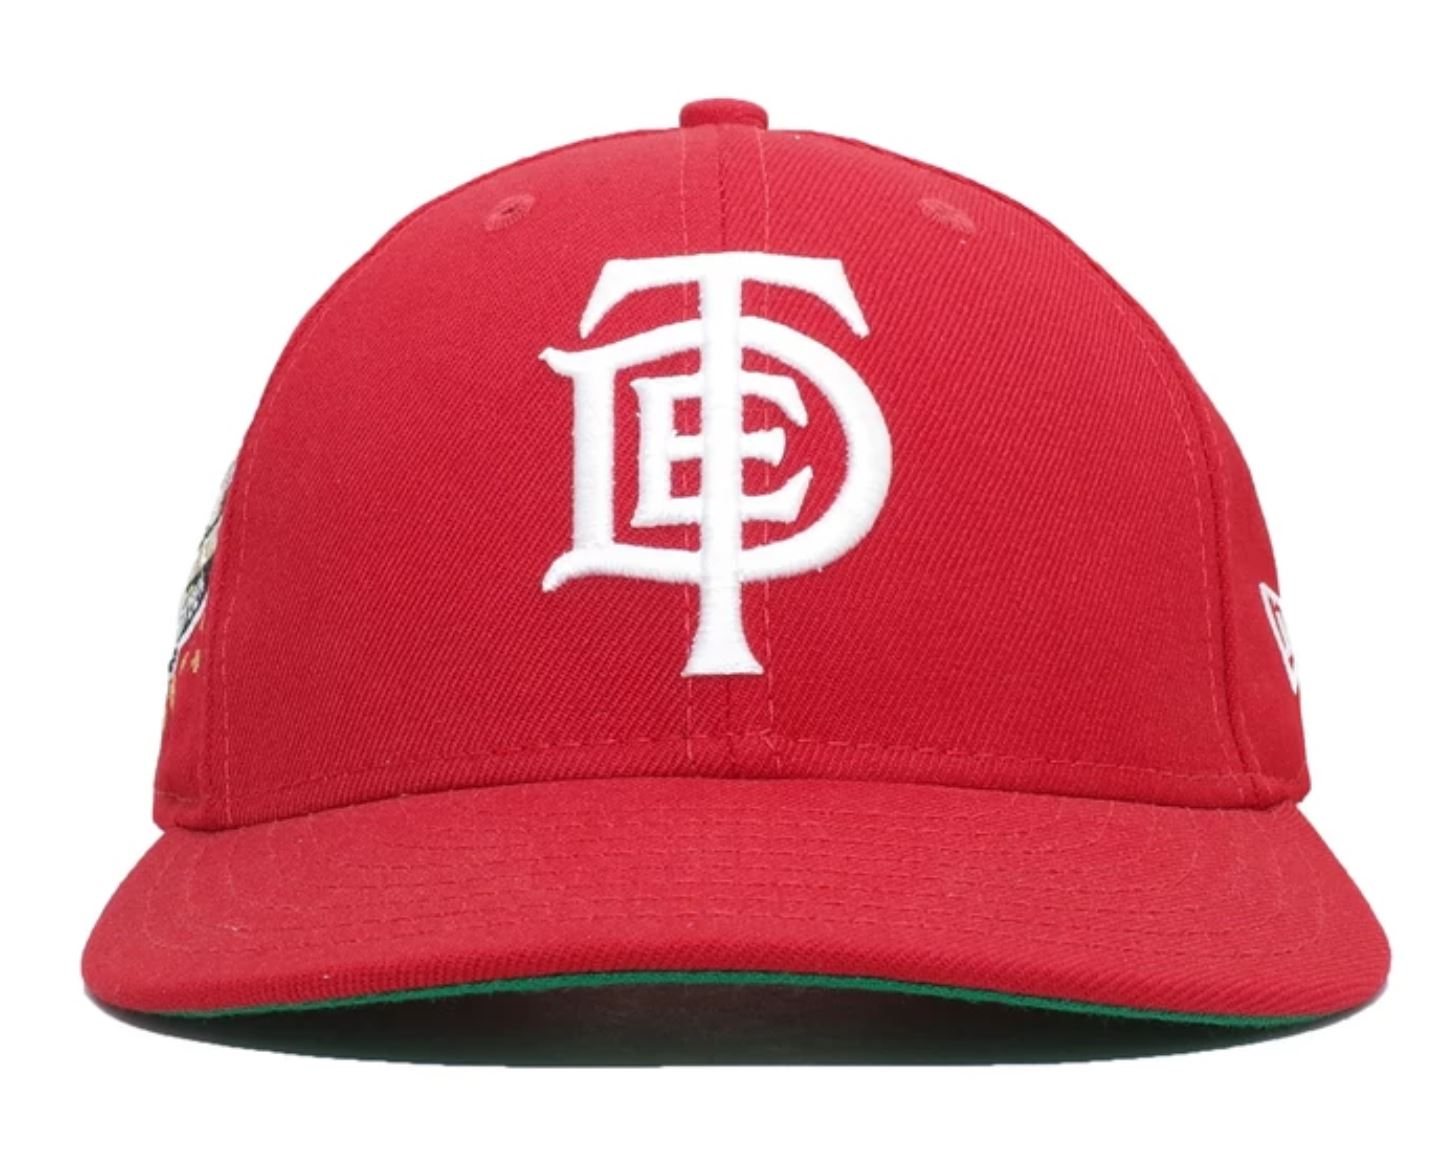 Red TDE Cap from txdxe.com